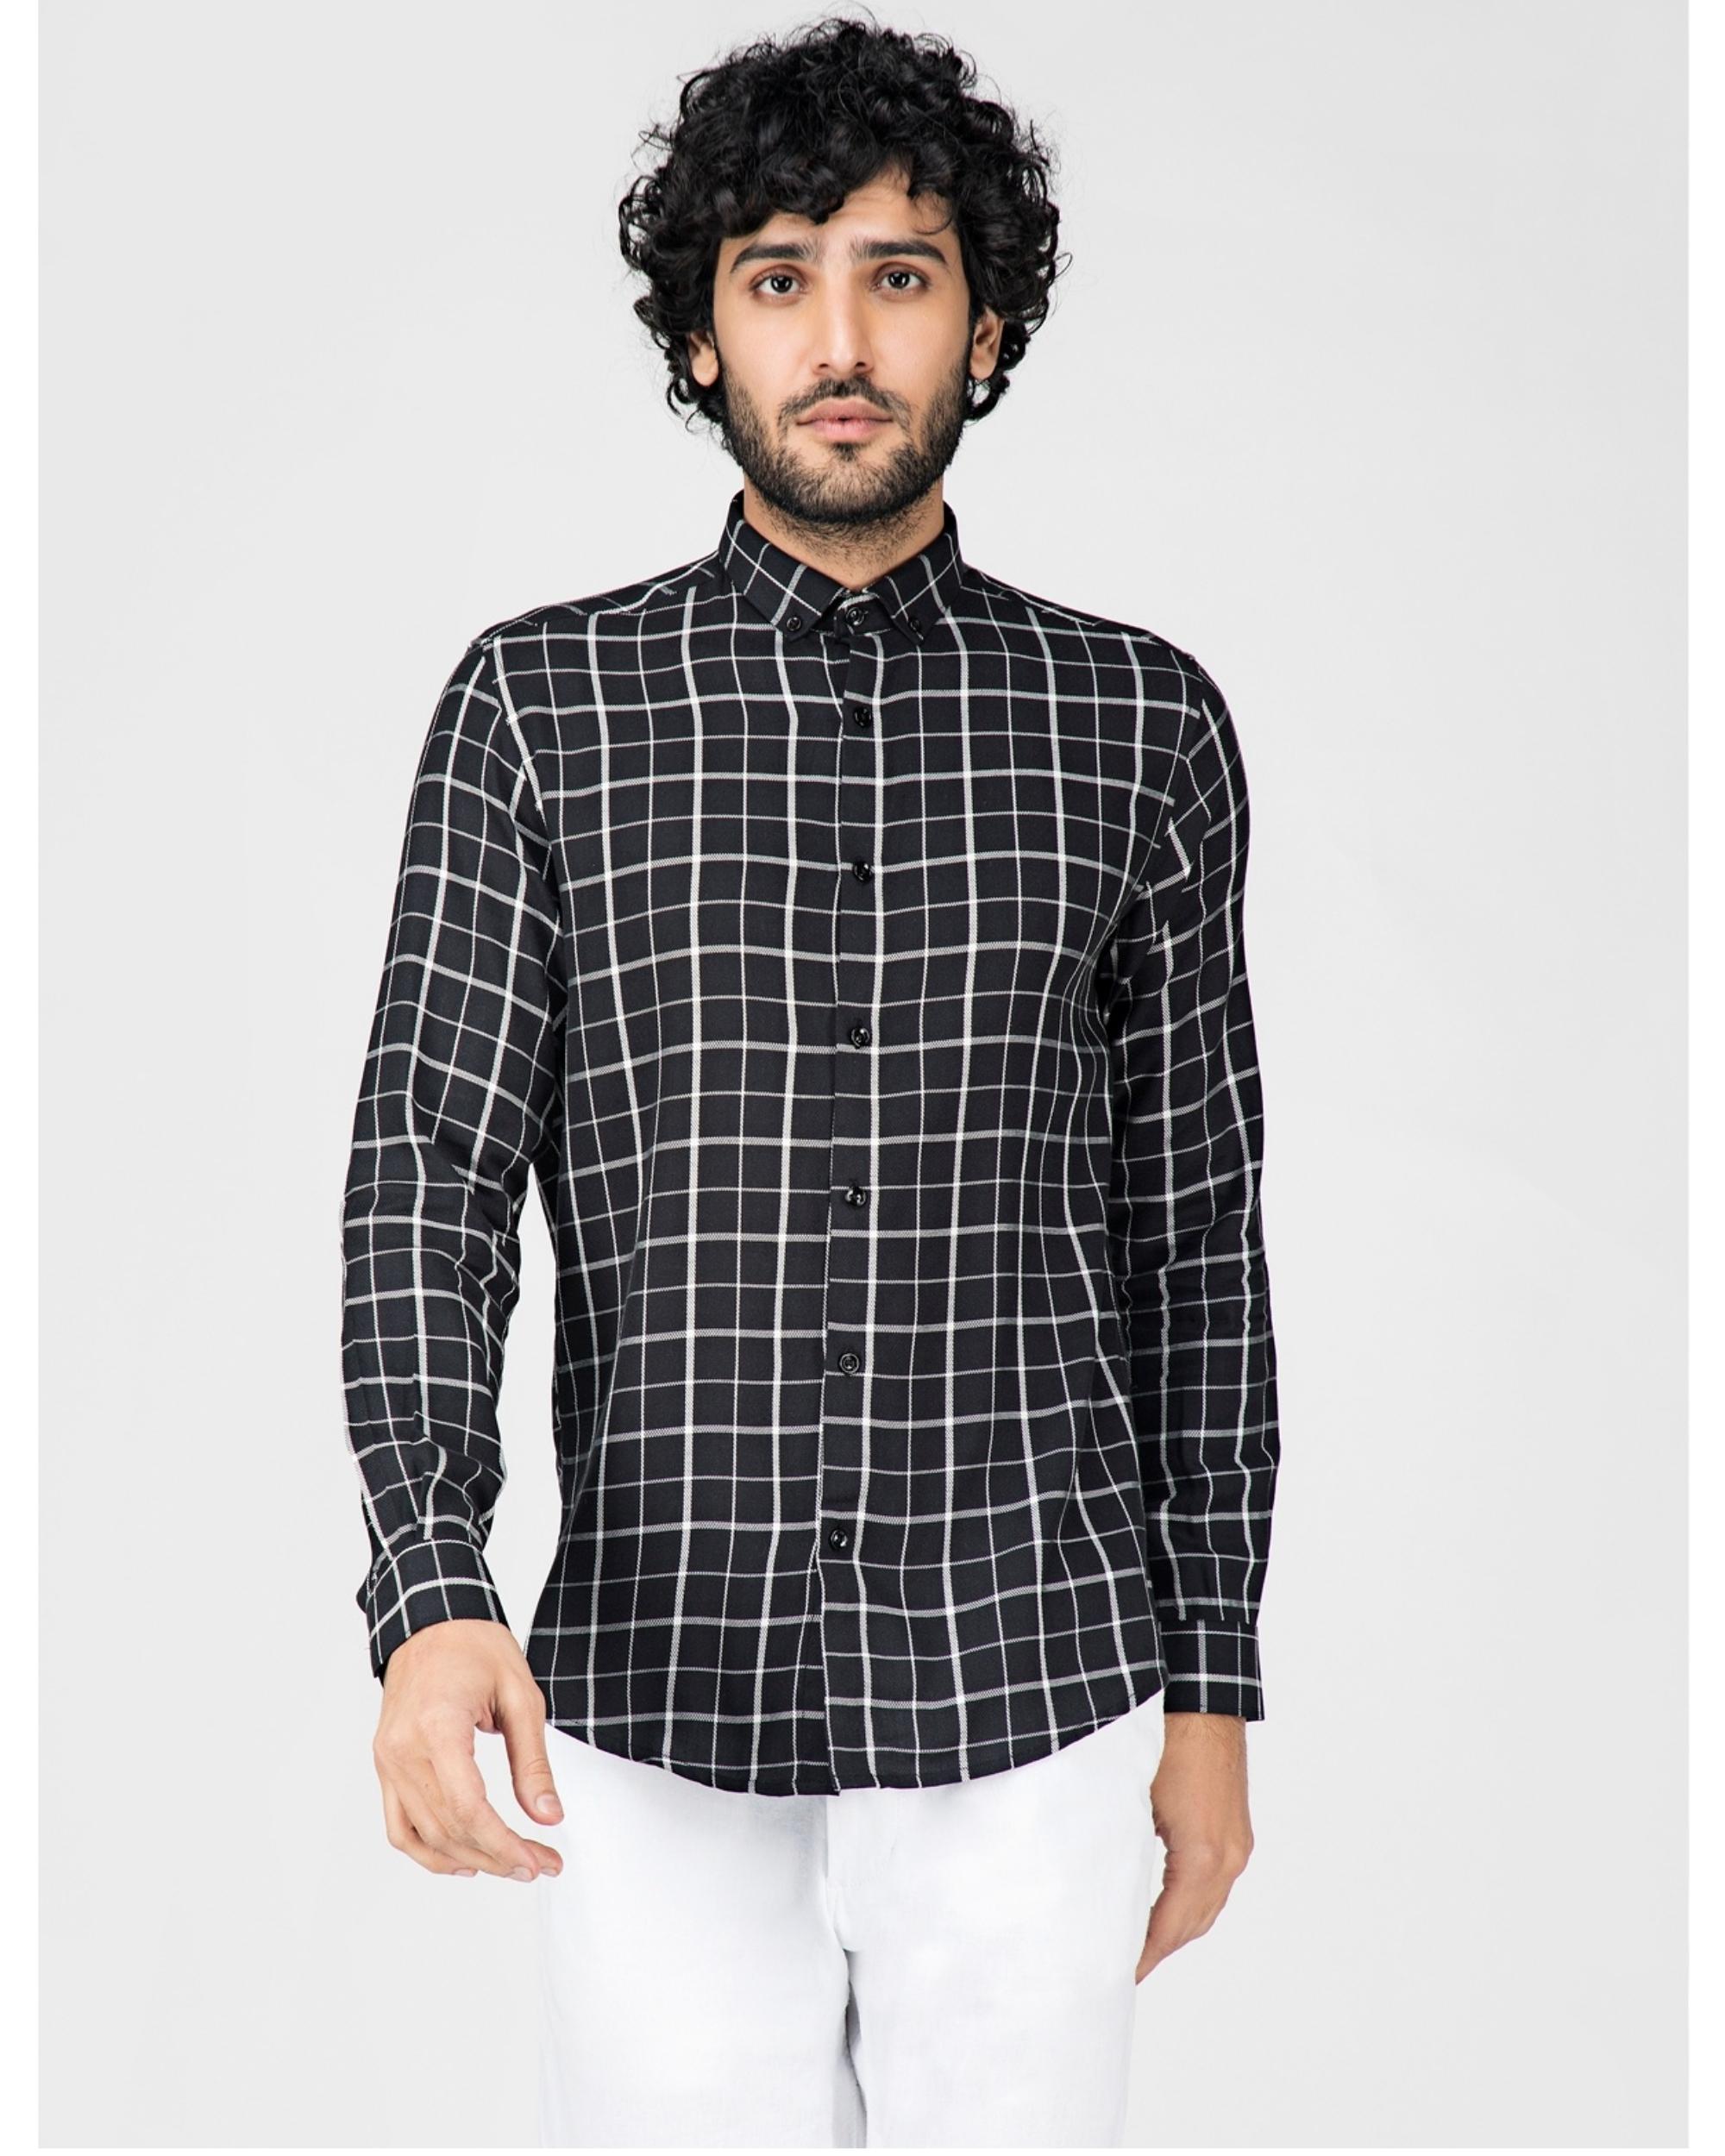 Black and white graph checkered shirt